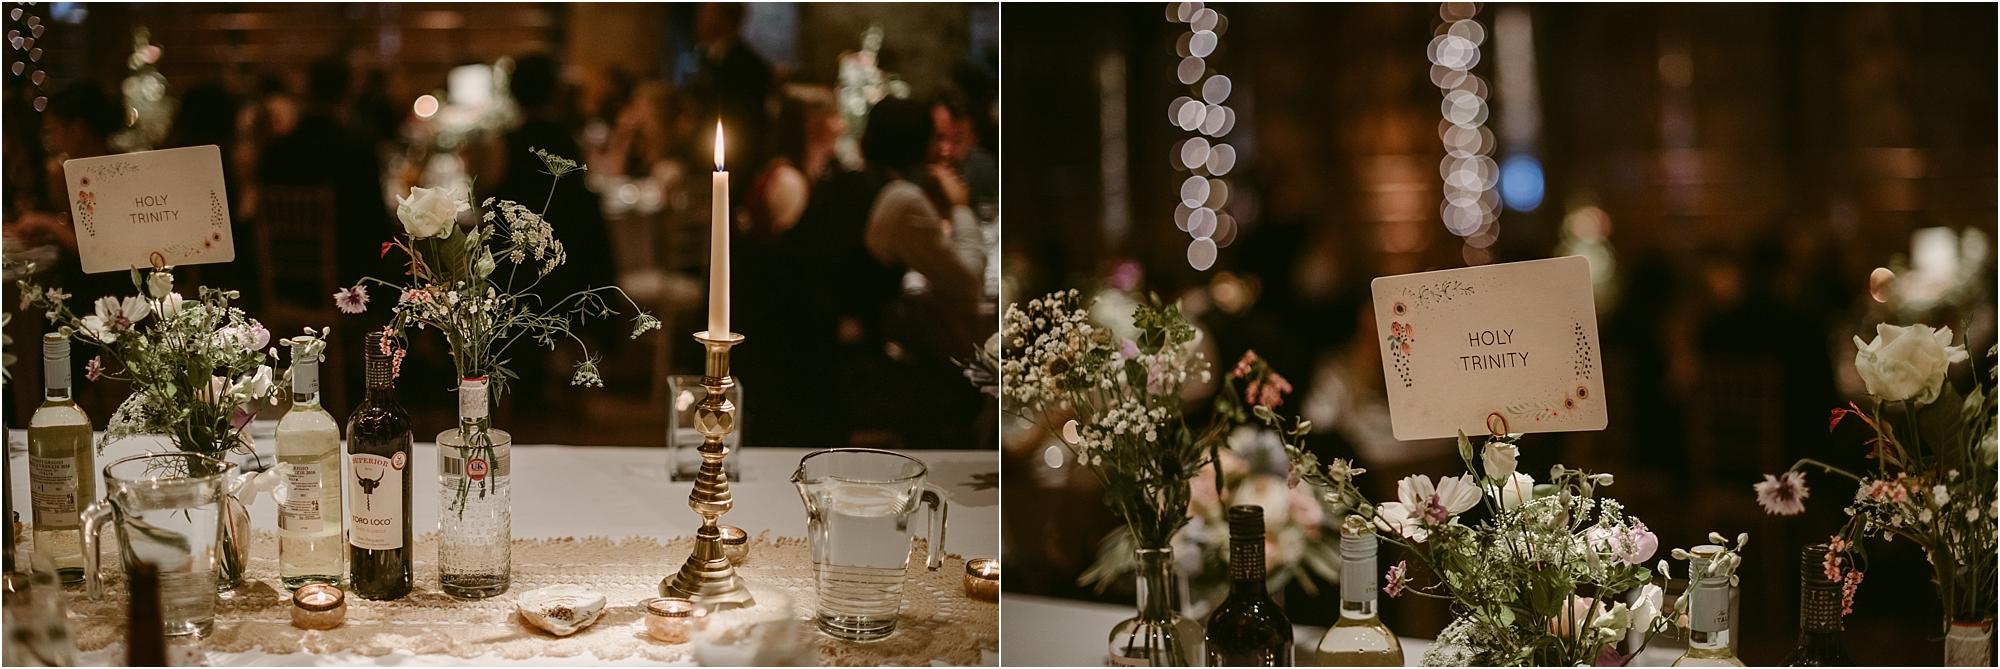 Scott+Joanna-Kinkell-Byre-wedding-fife-photography__0073.jpg